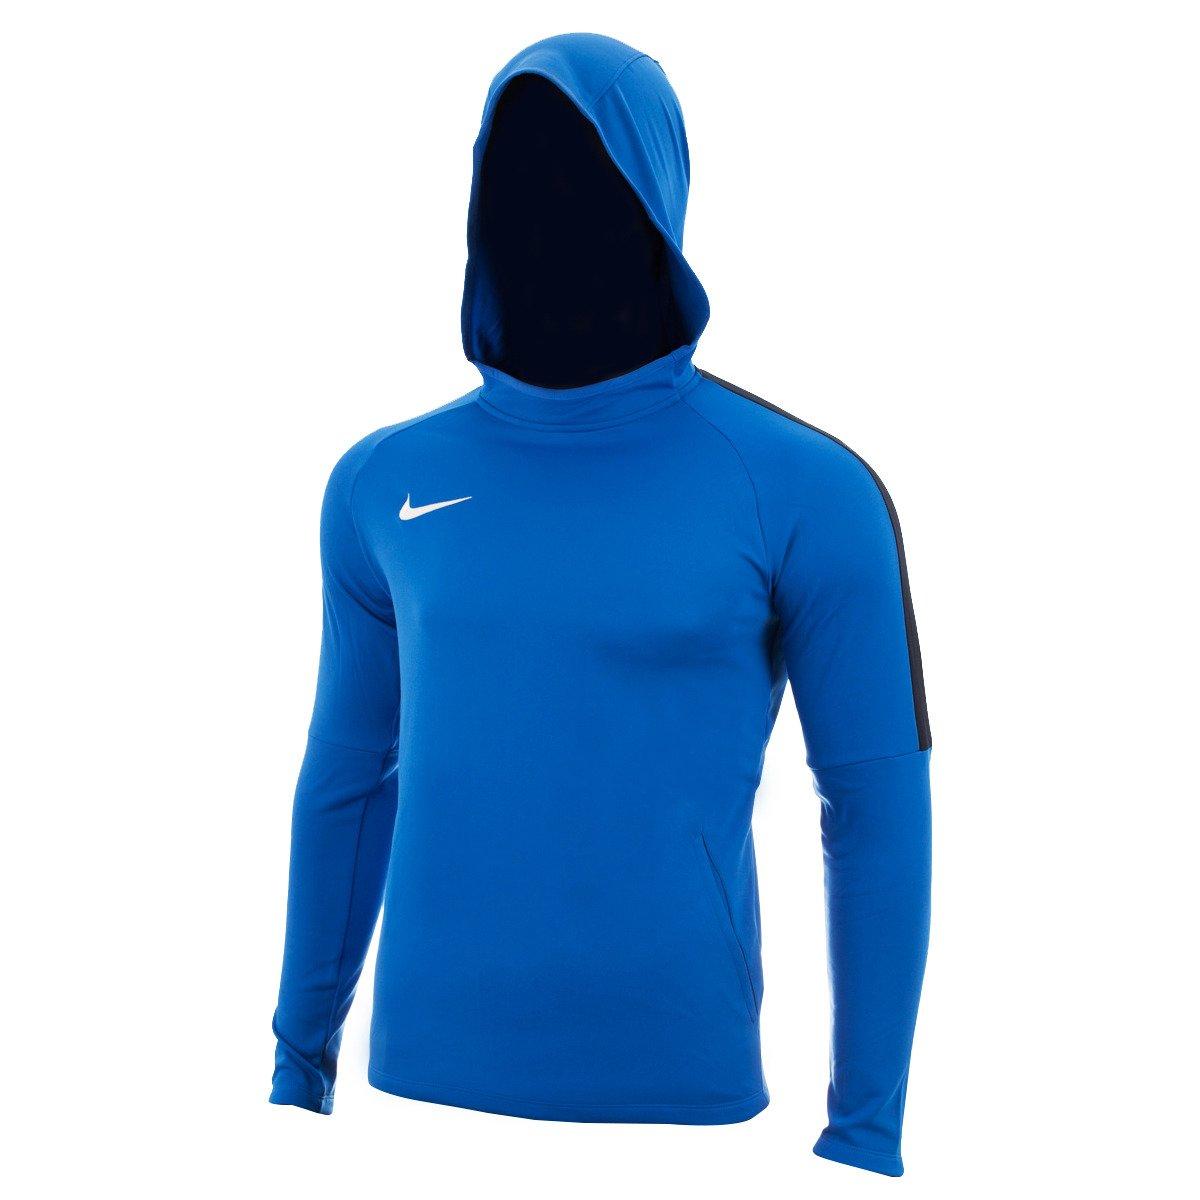 Bluza męska Nike Dry Academy 18 Hoodie PO niebieska AH9608 463